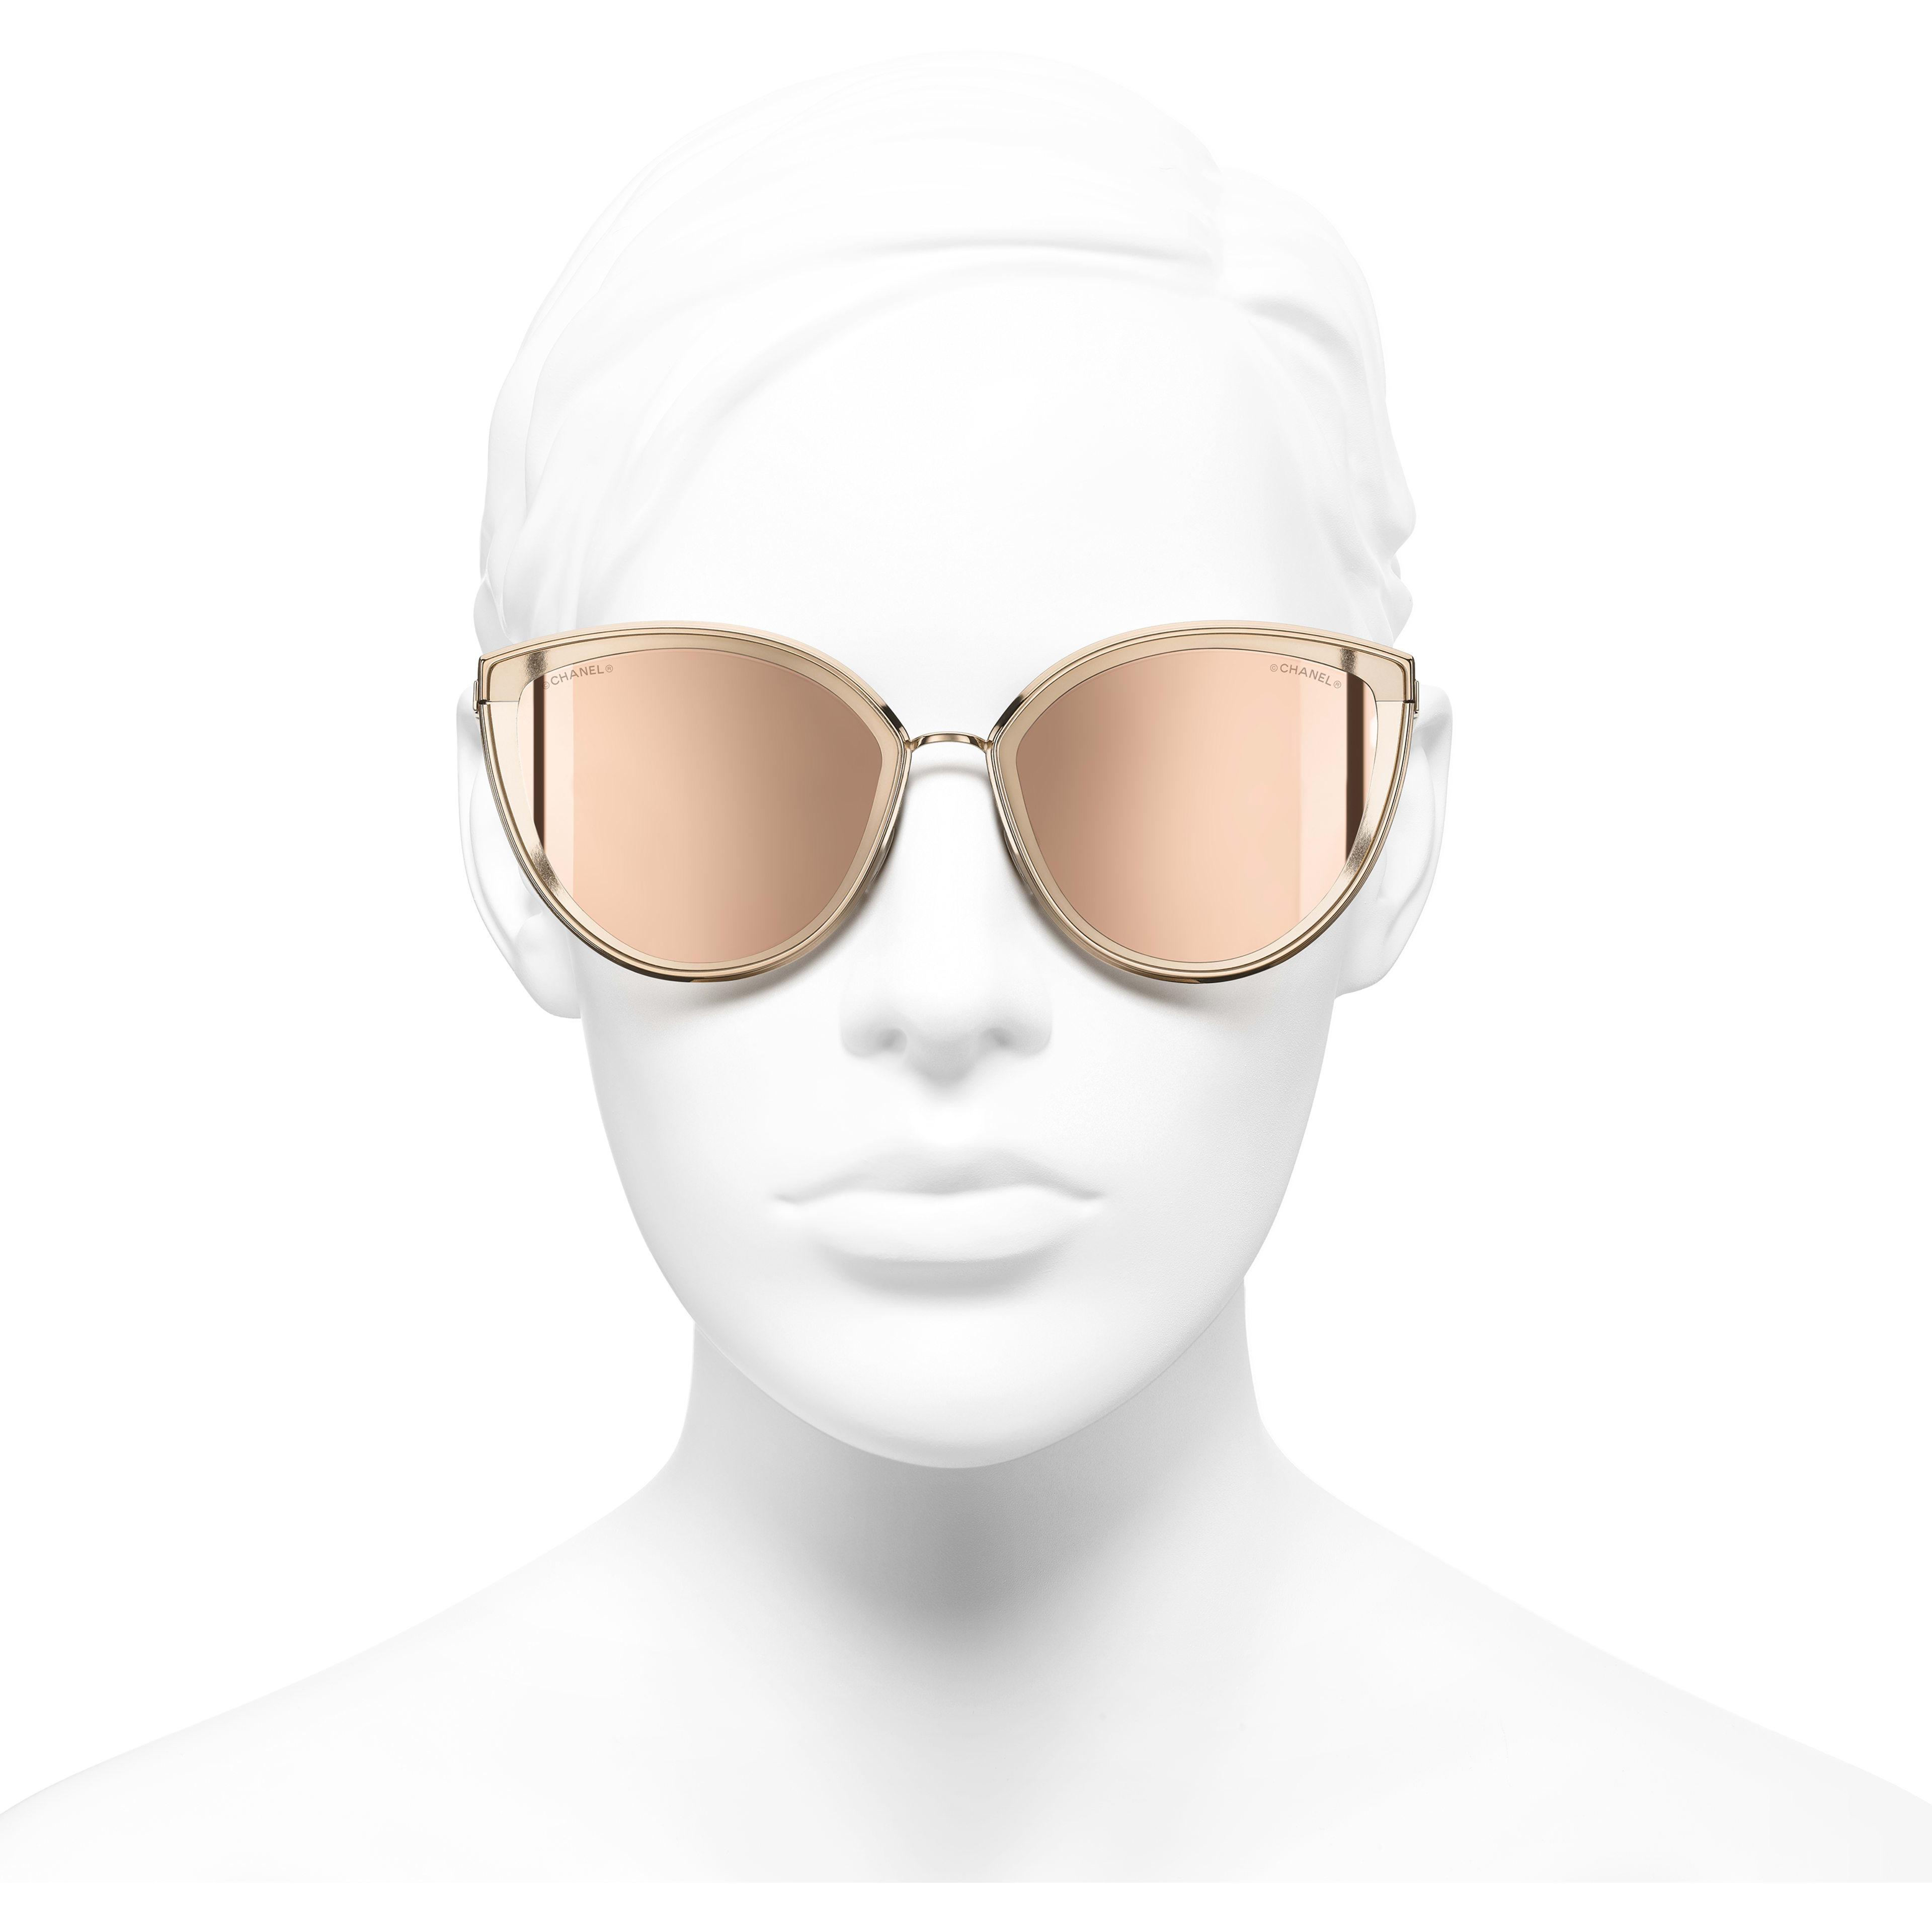 15fdadd64f2 ... Cat Eye Sunglasses - Pink Gold - Metal - 18-Karat Gold Lenses - Worn